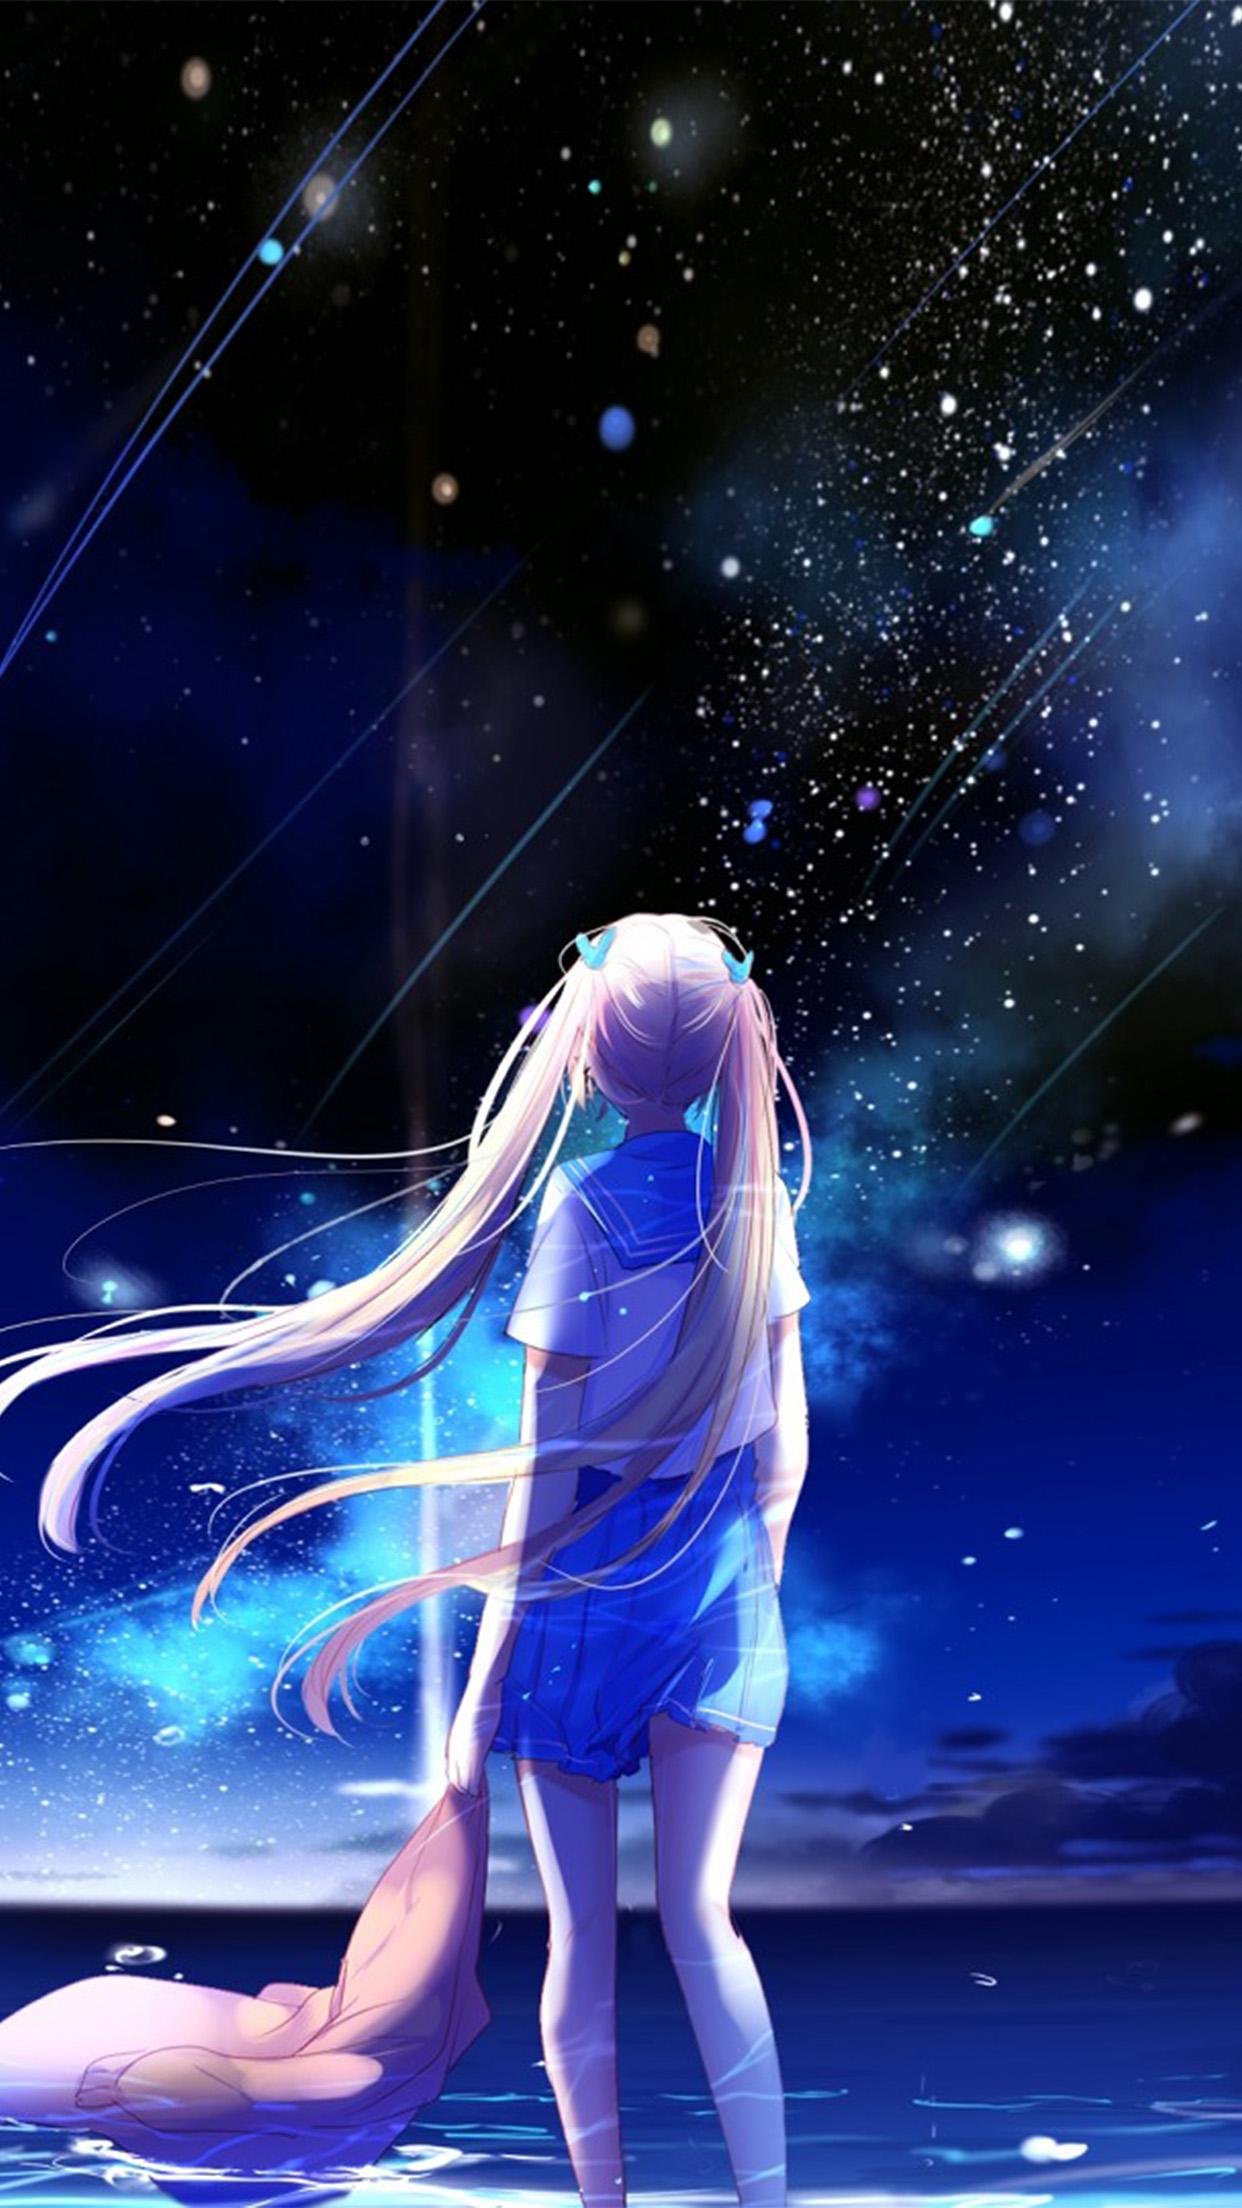 Fall Romance Wallpaper Bc64 Anime Night Space Star Art Illustration Wallpaper